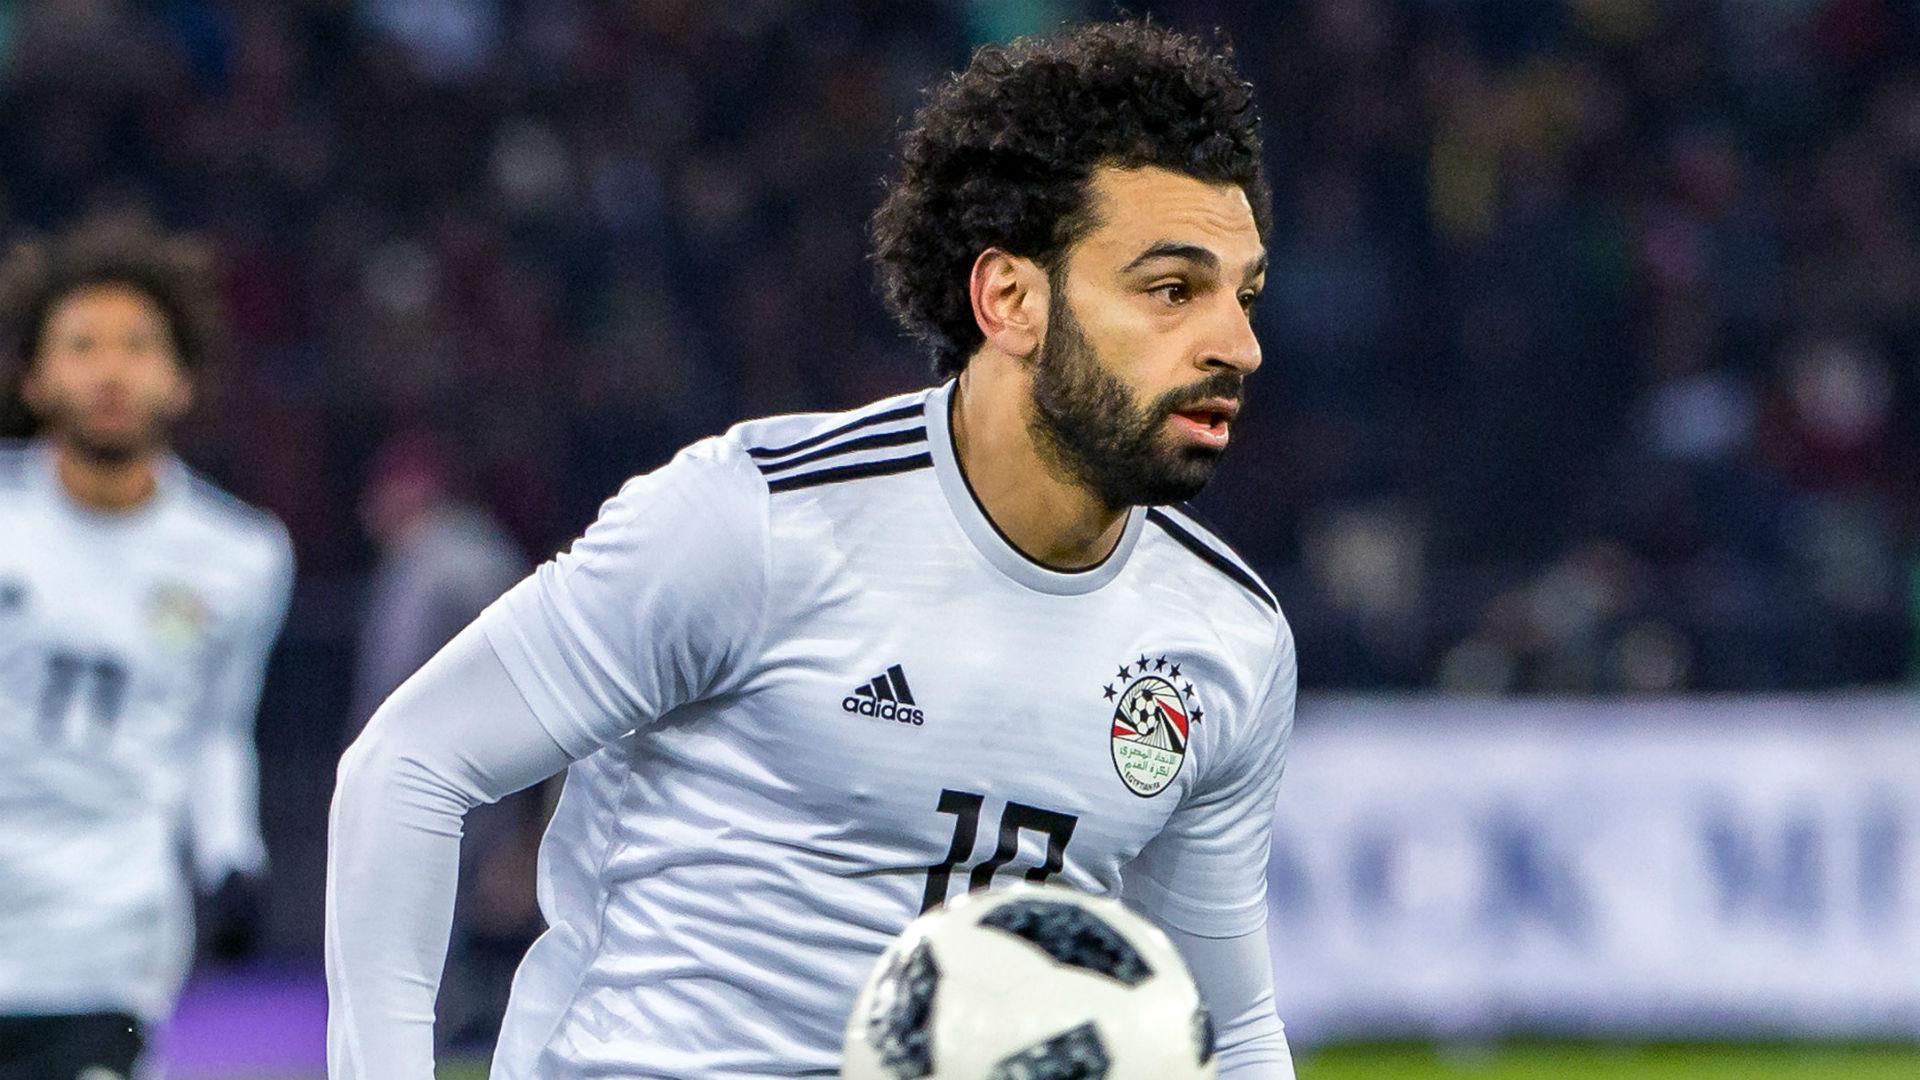 Mohamed Salah: Egypt Coach Cuper Declares Salah Among World's Best